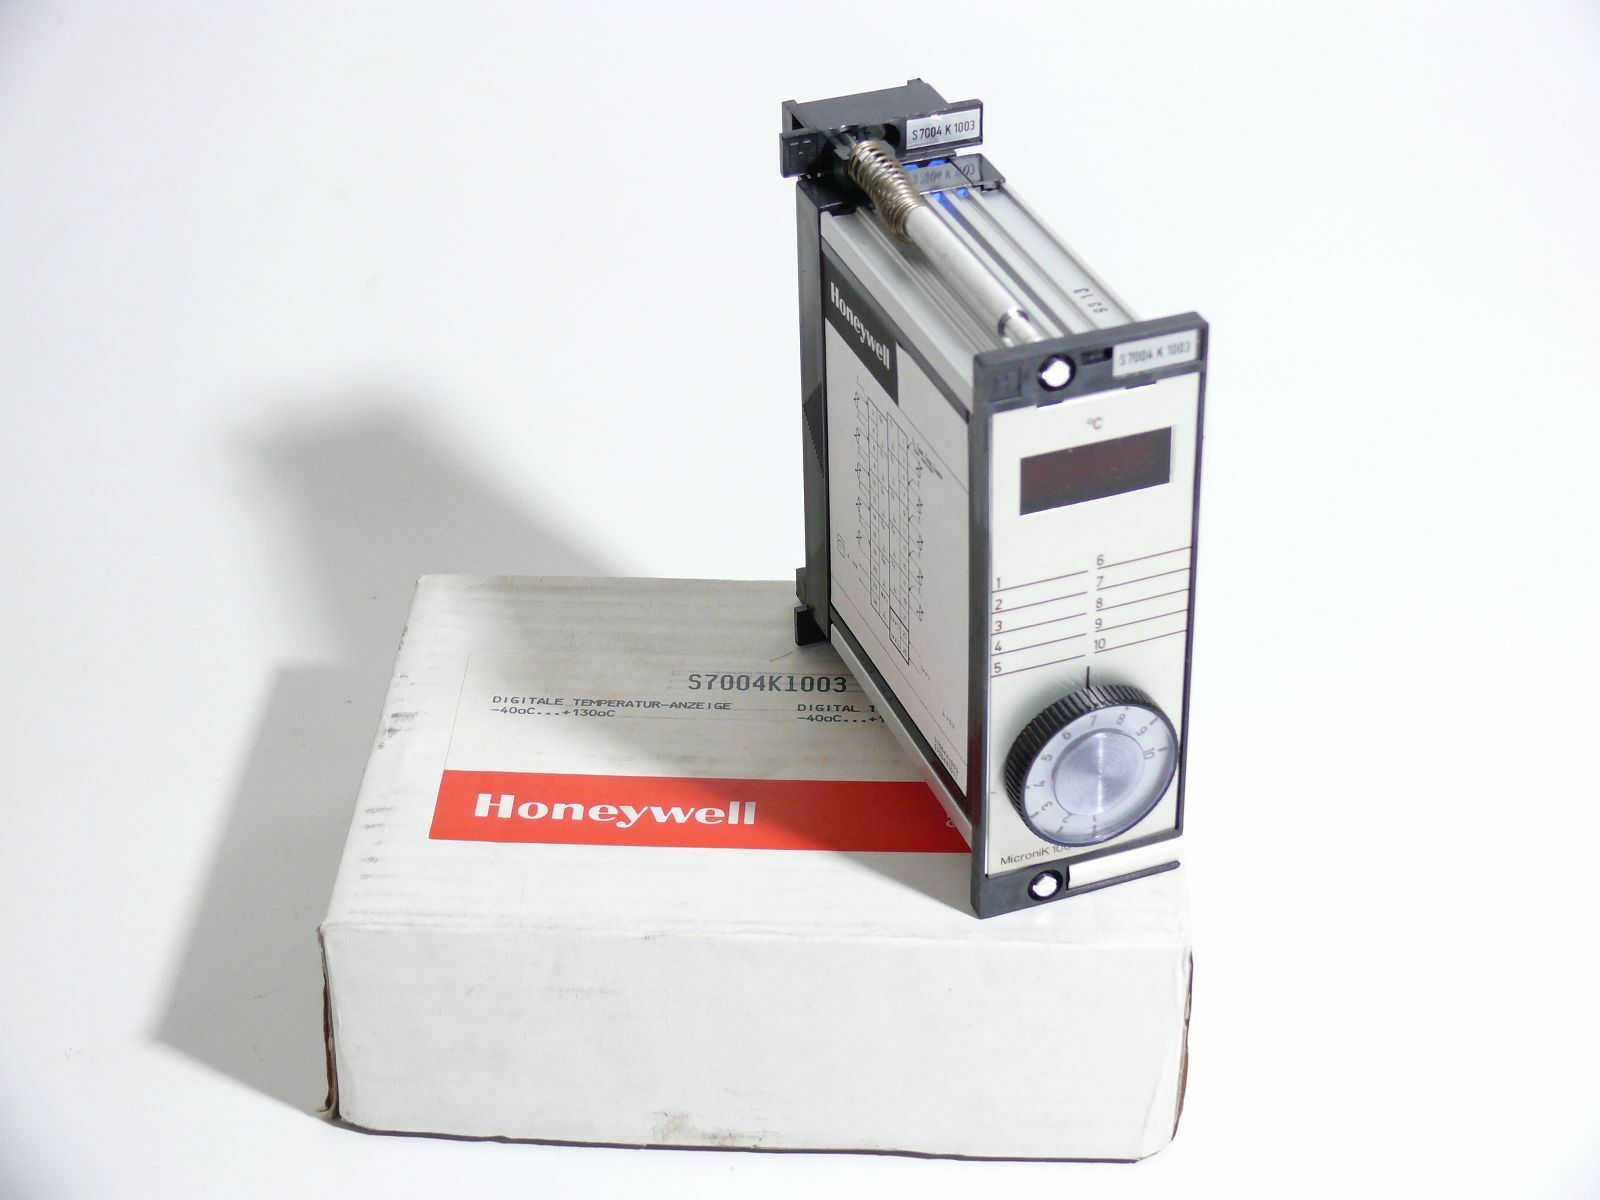 HONEYWELL Digitale Digitale Digitale Temperatur-Anzeige Micronik S7004K1003    07bd03